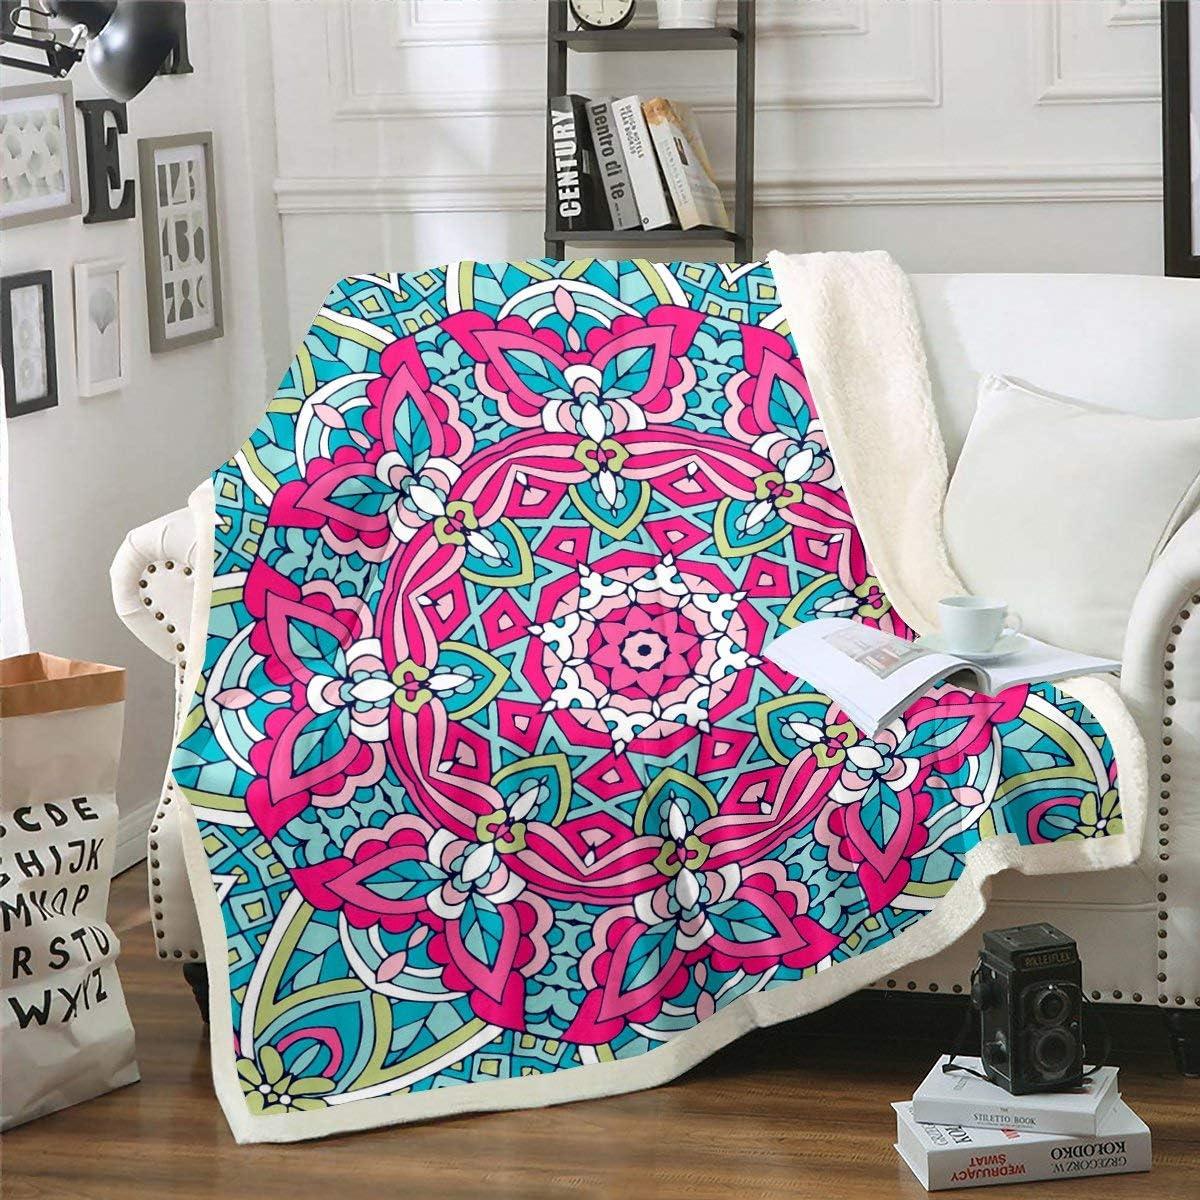 Boho Mandala Fleece Throw Blanket Printed Super intense Outlet ☆ Free Shipping SALE Blanke Bohemian Sherpa